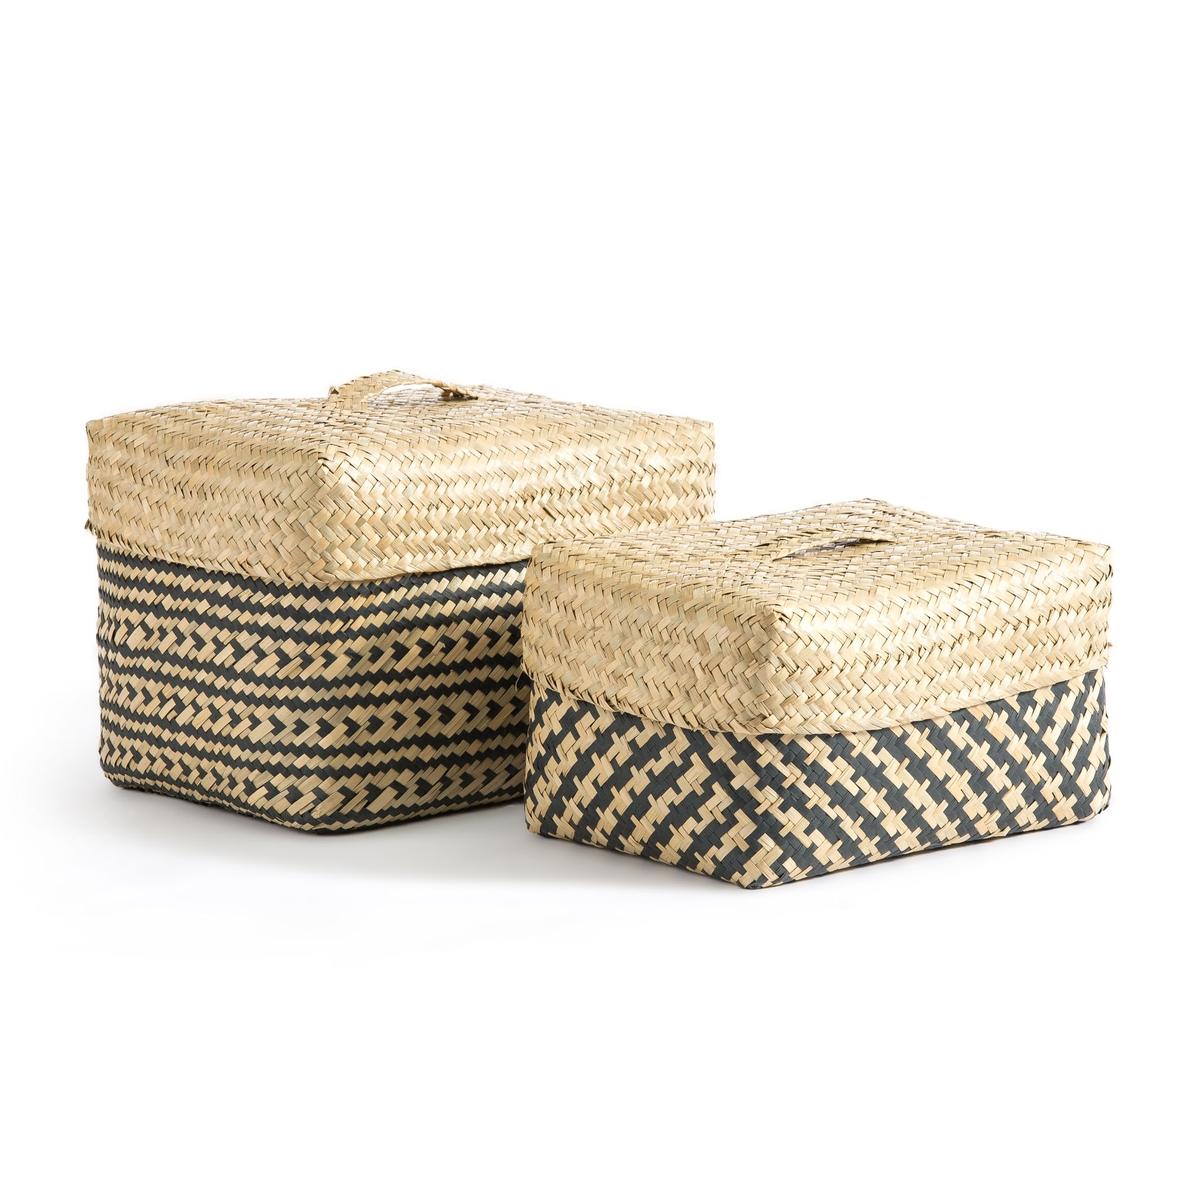 Комплект из 2 корзин, Kotak LaRedoute La Redoute единый размер бежевый пуф la redoute из шерсти carito единый размер серый